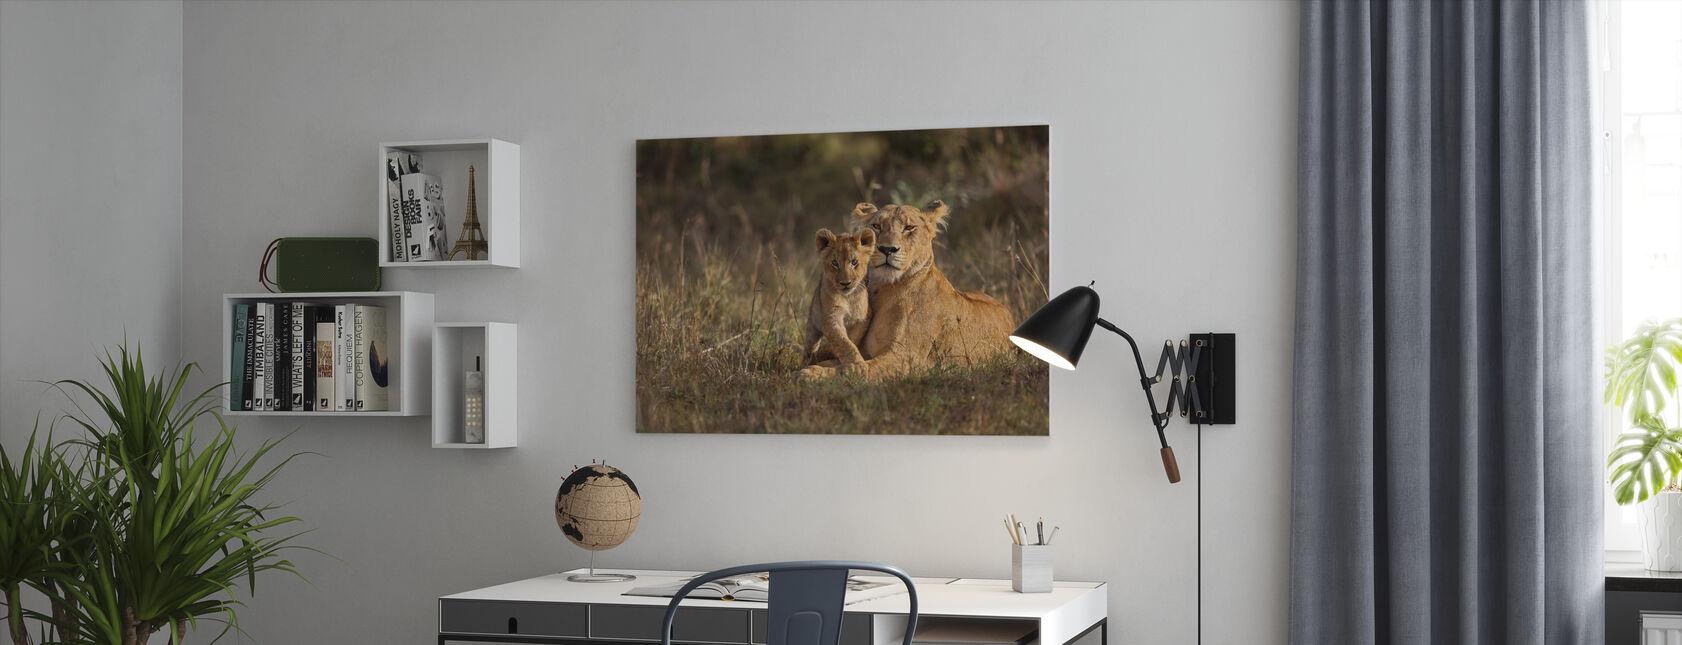 Lejonmor och unge - Canvastavla - Kontor